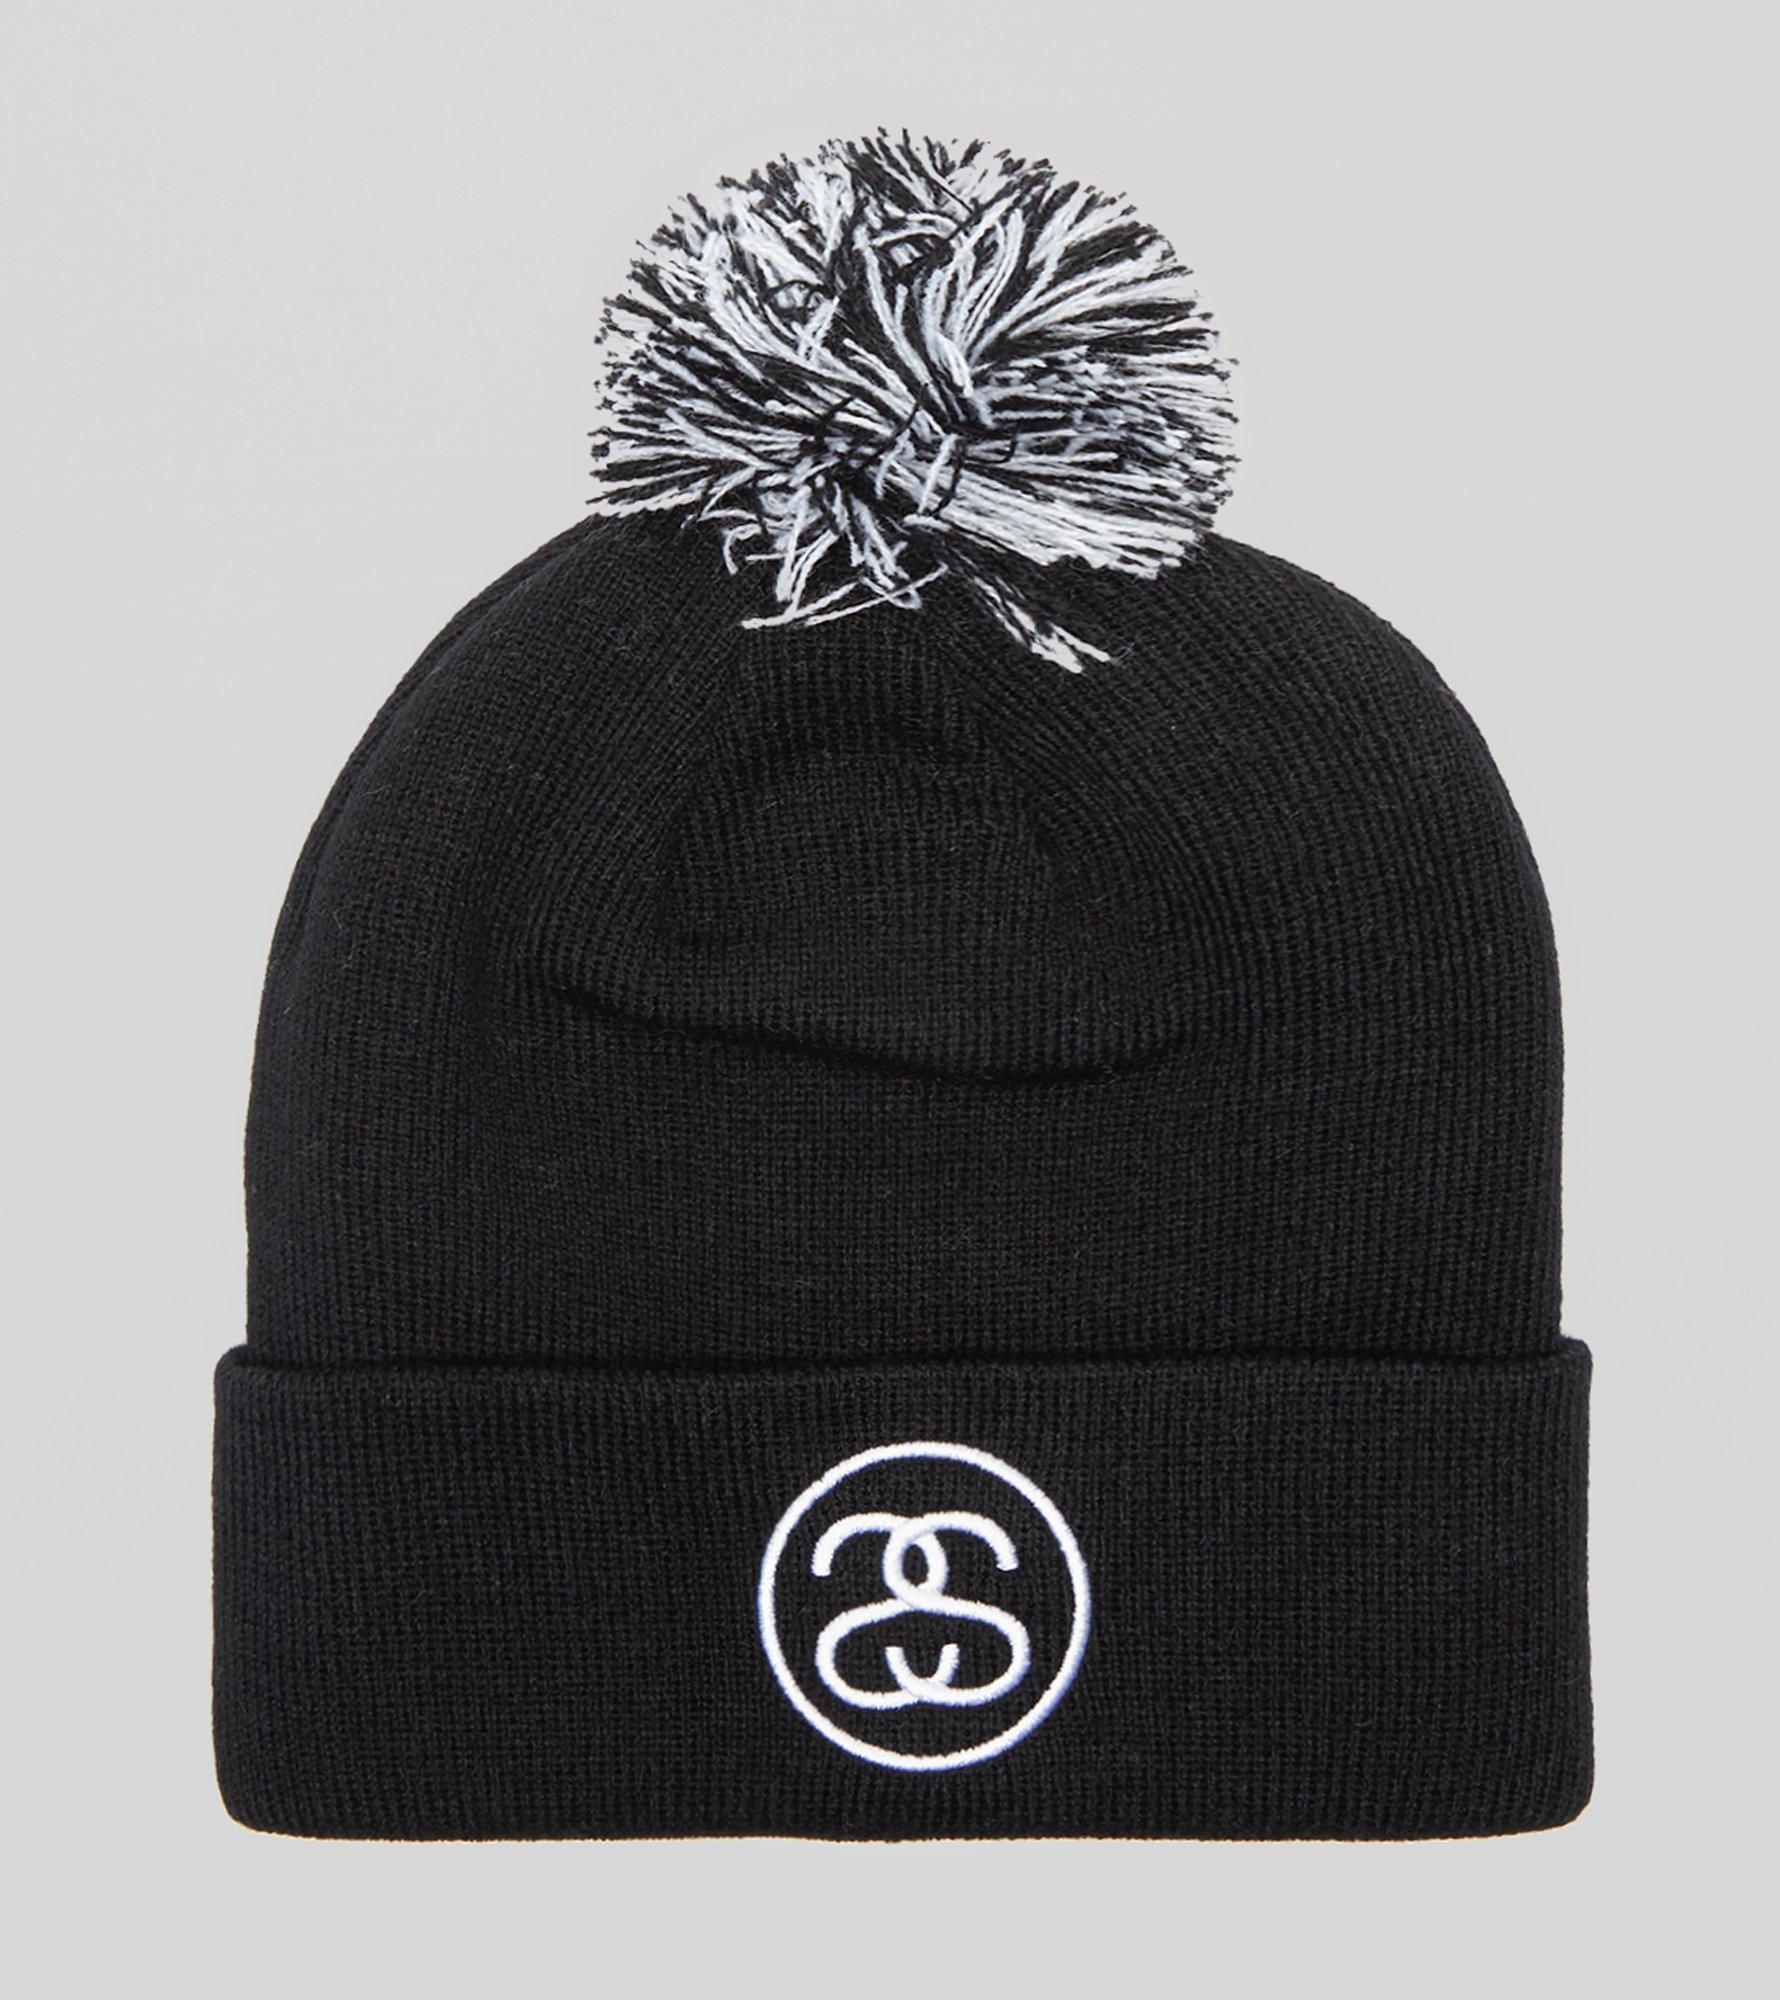 Stussy Ss Link Pom Beanie Hat in Black - Lyst fa95d3bf5f